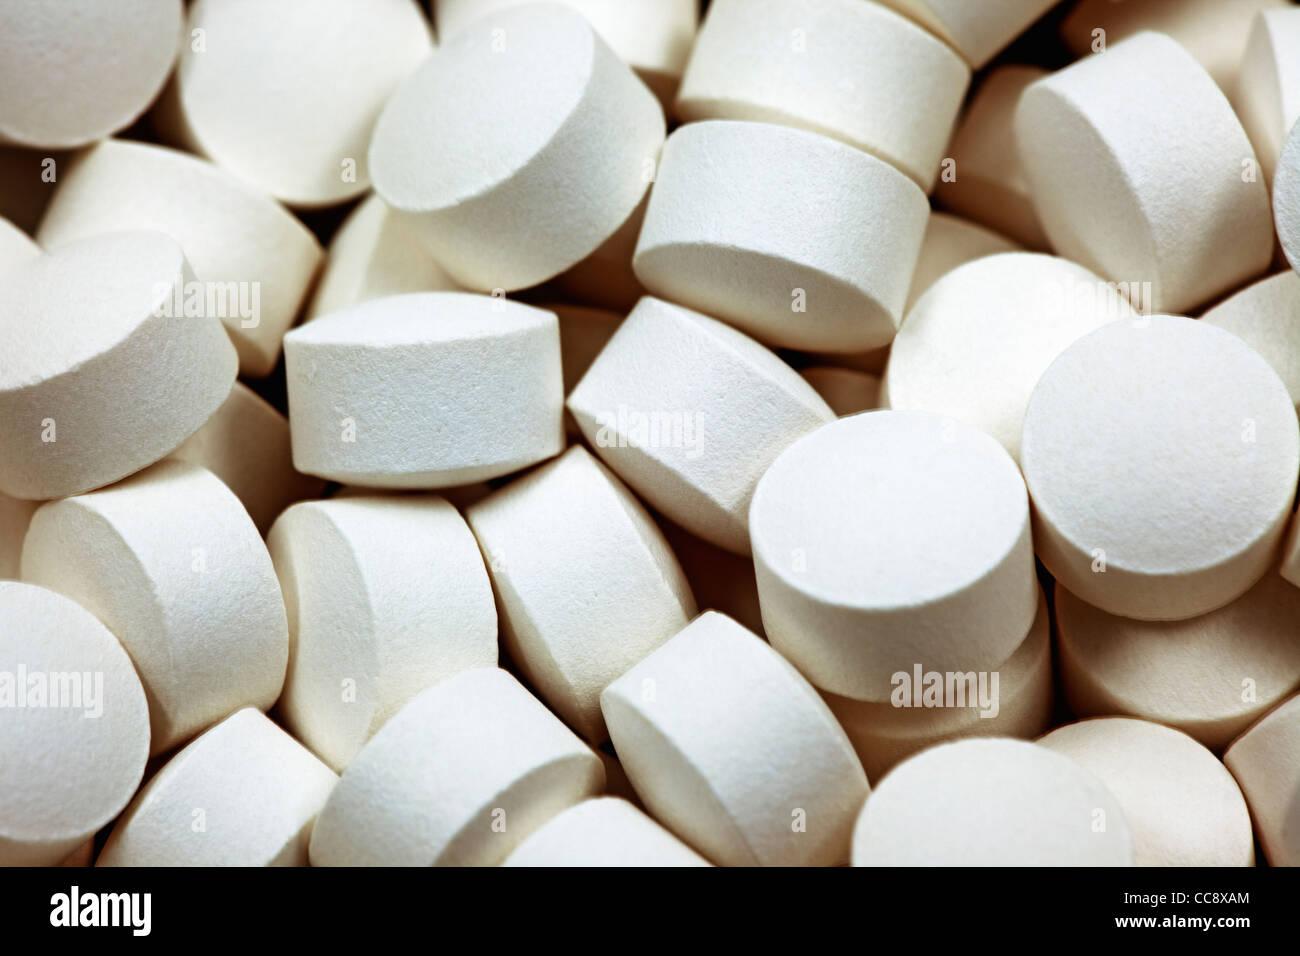 white pills - Stock Image